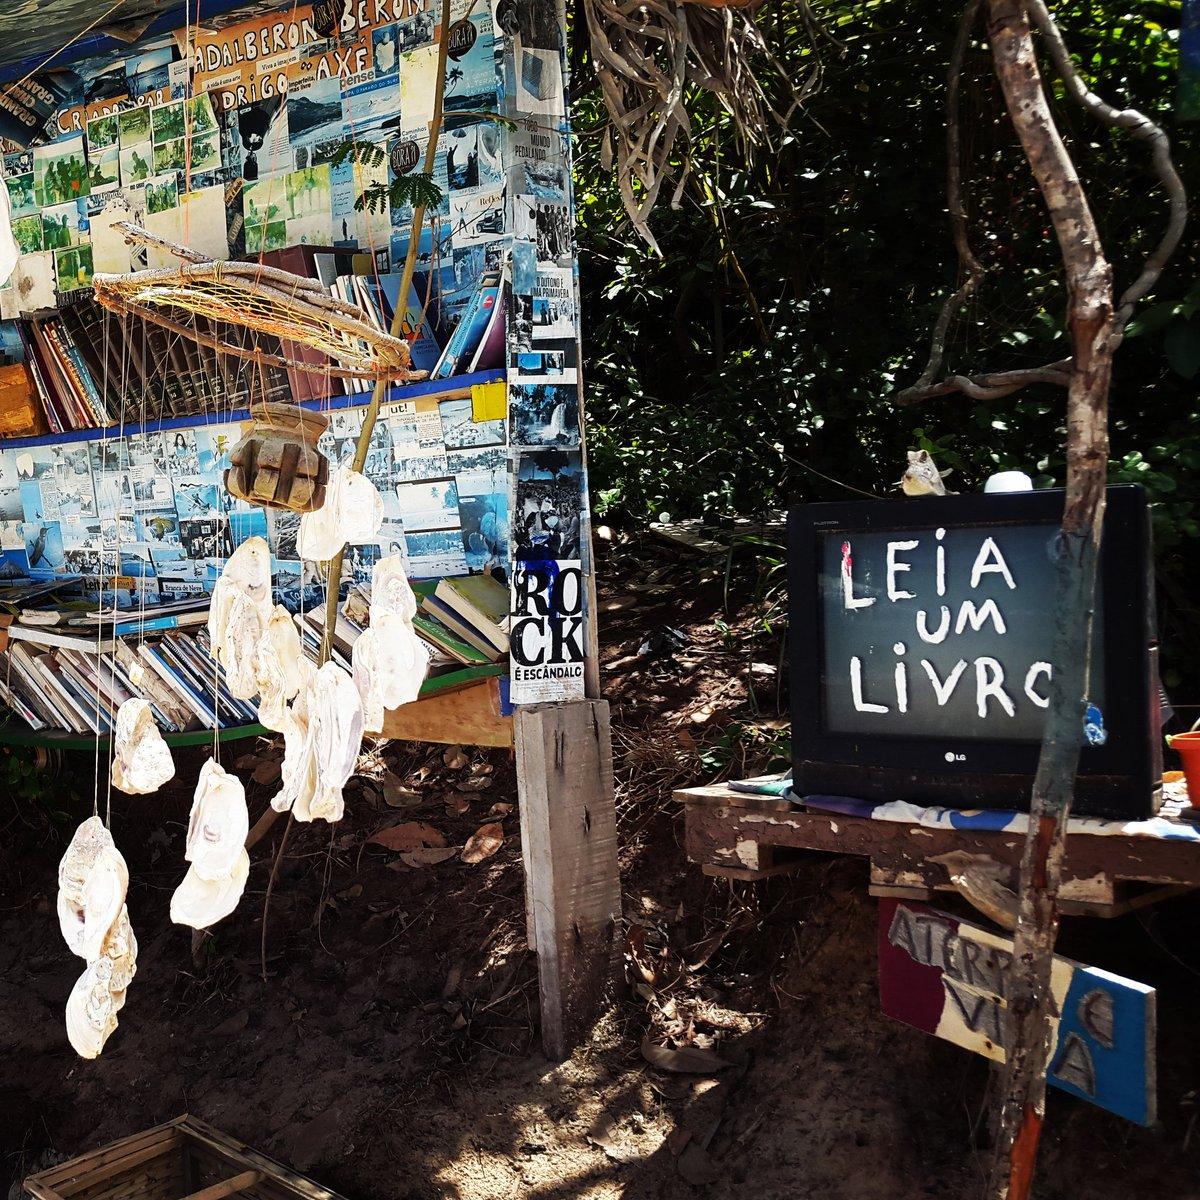 A library on the beach! Praia do Amor in Pipa #ReadABook #UrbanEquipment #publiclibrary #praiadoamor #Pipa  #publicspace #citiesforpleoplepic.twitter.com/0lcZG8n24q